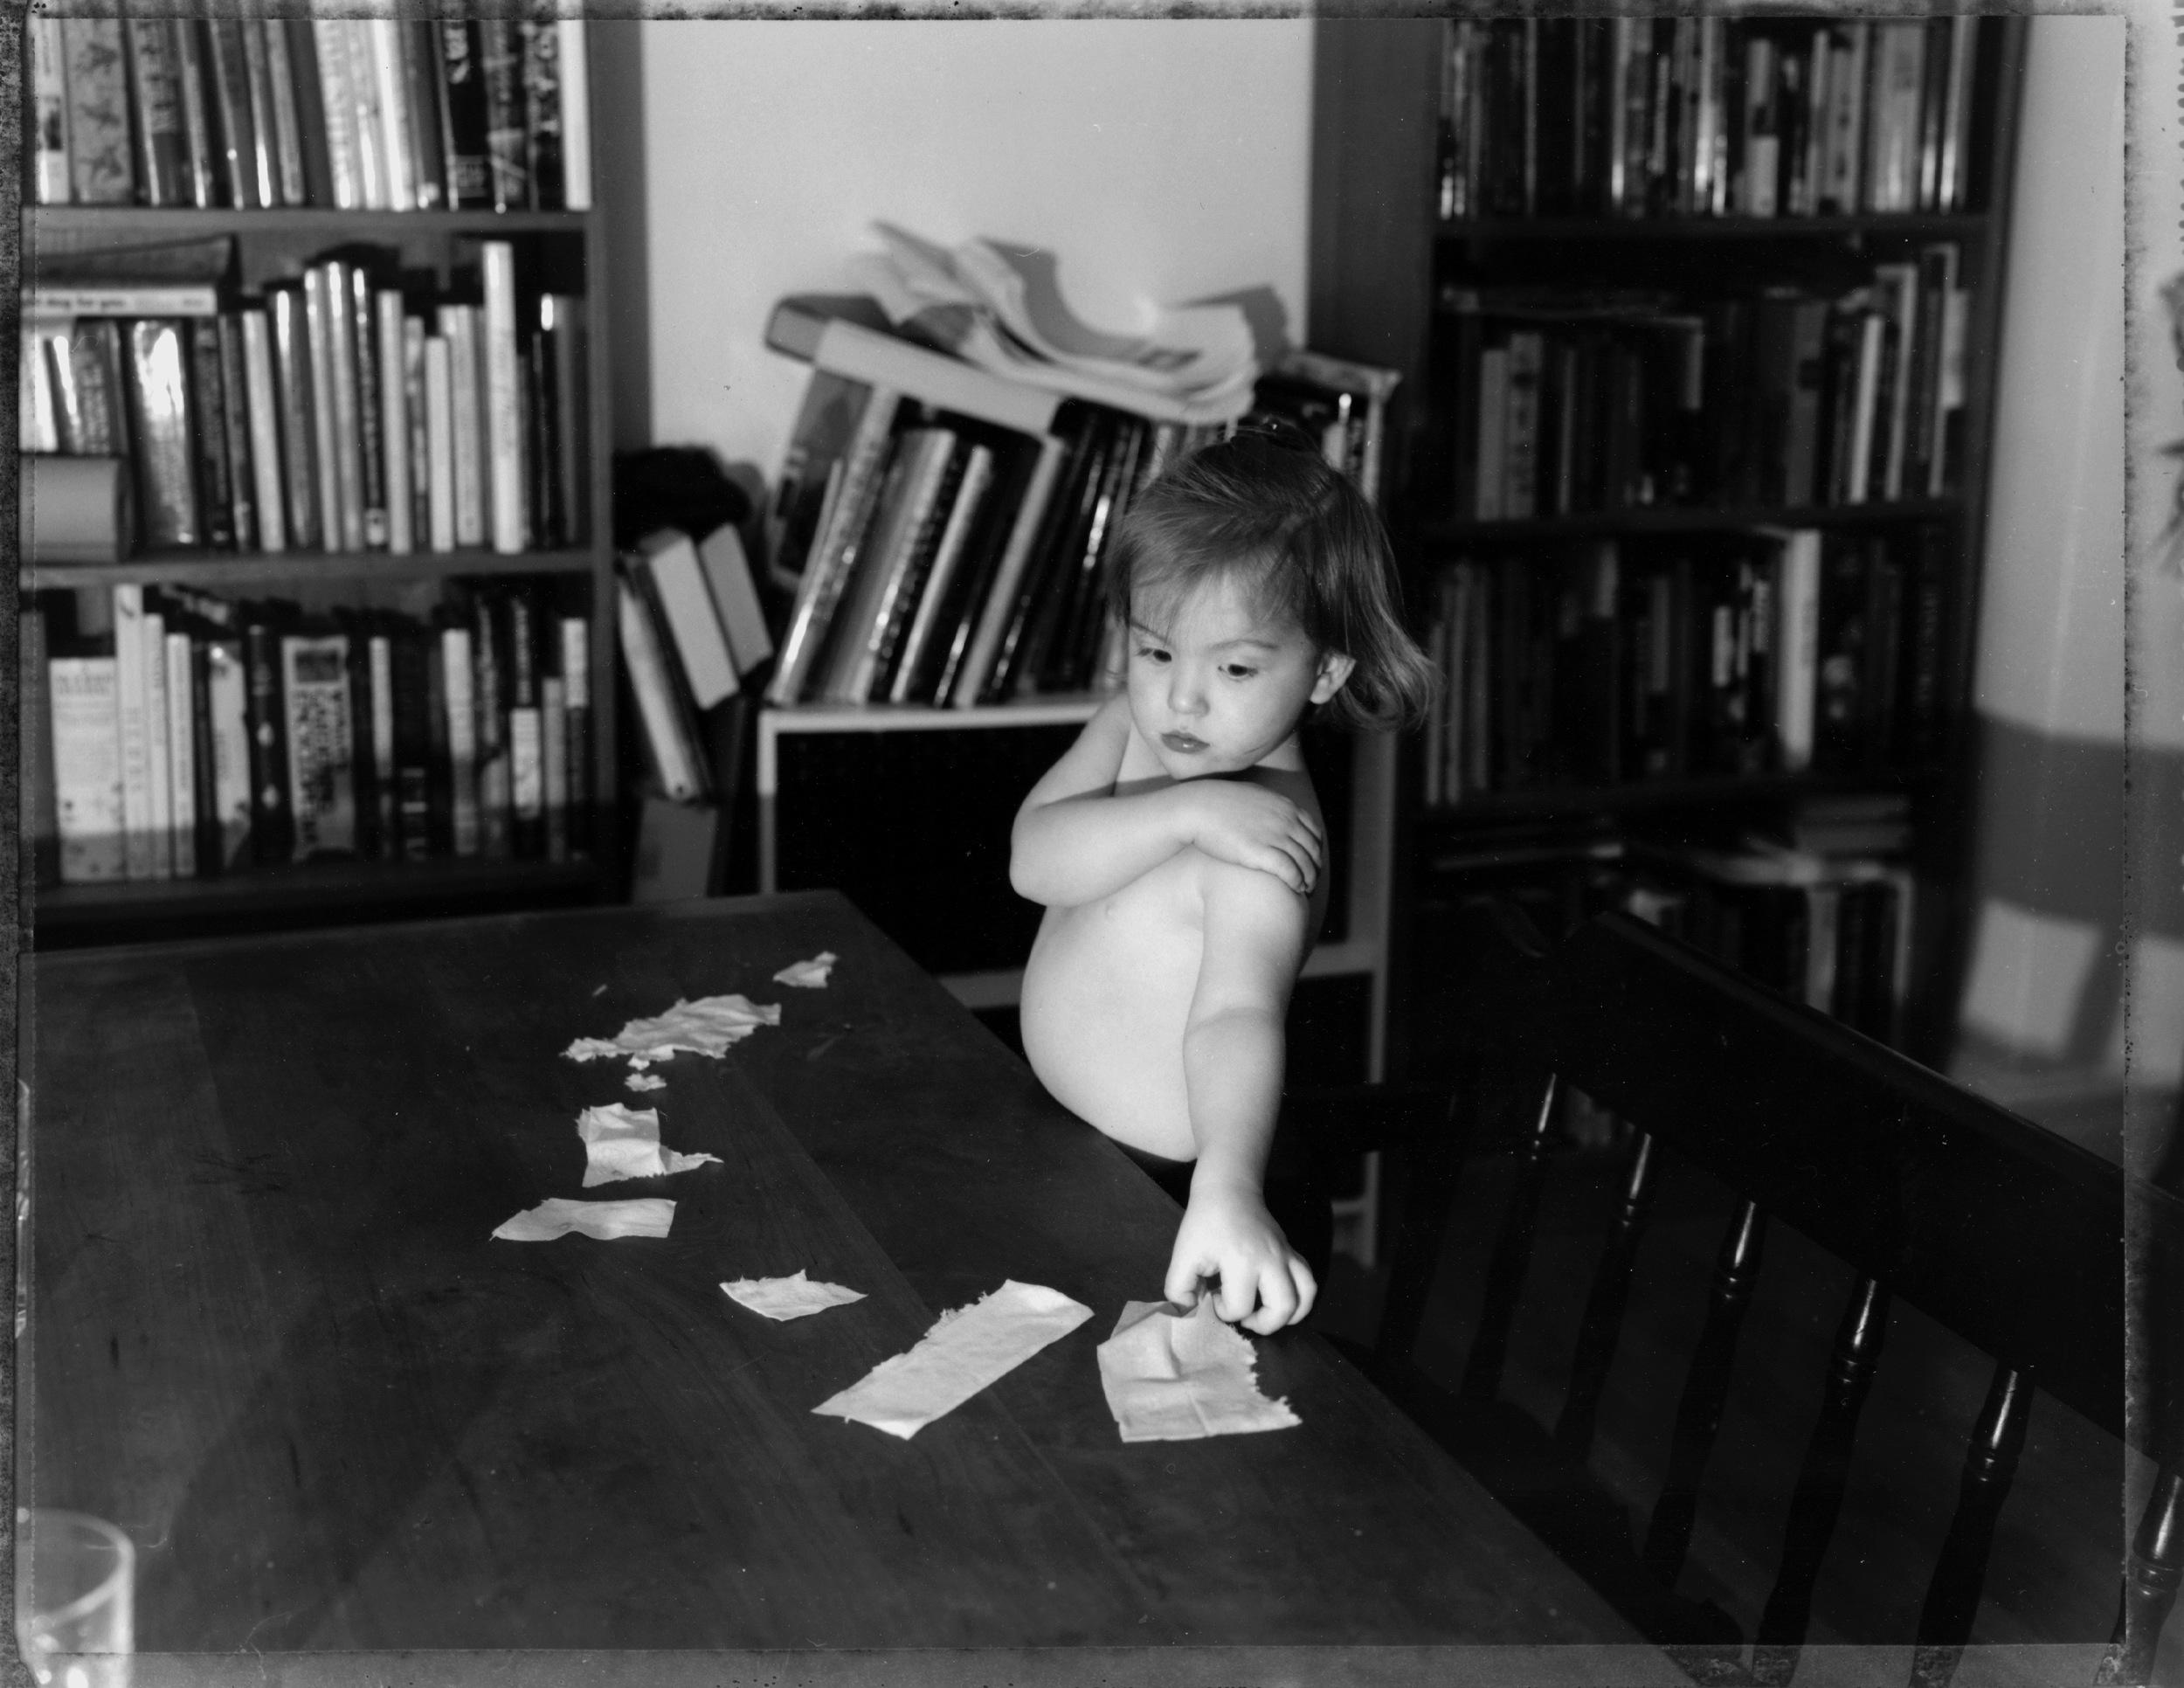 Childhood (1993-99)